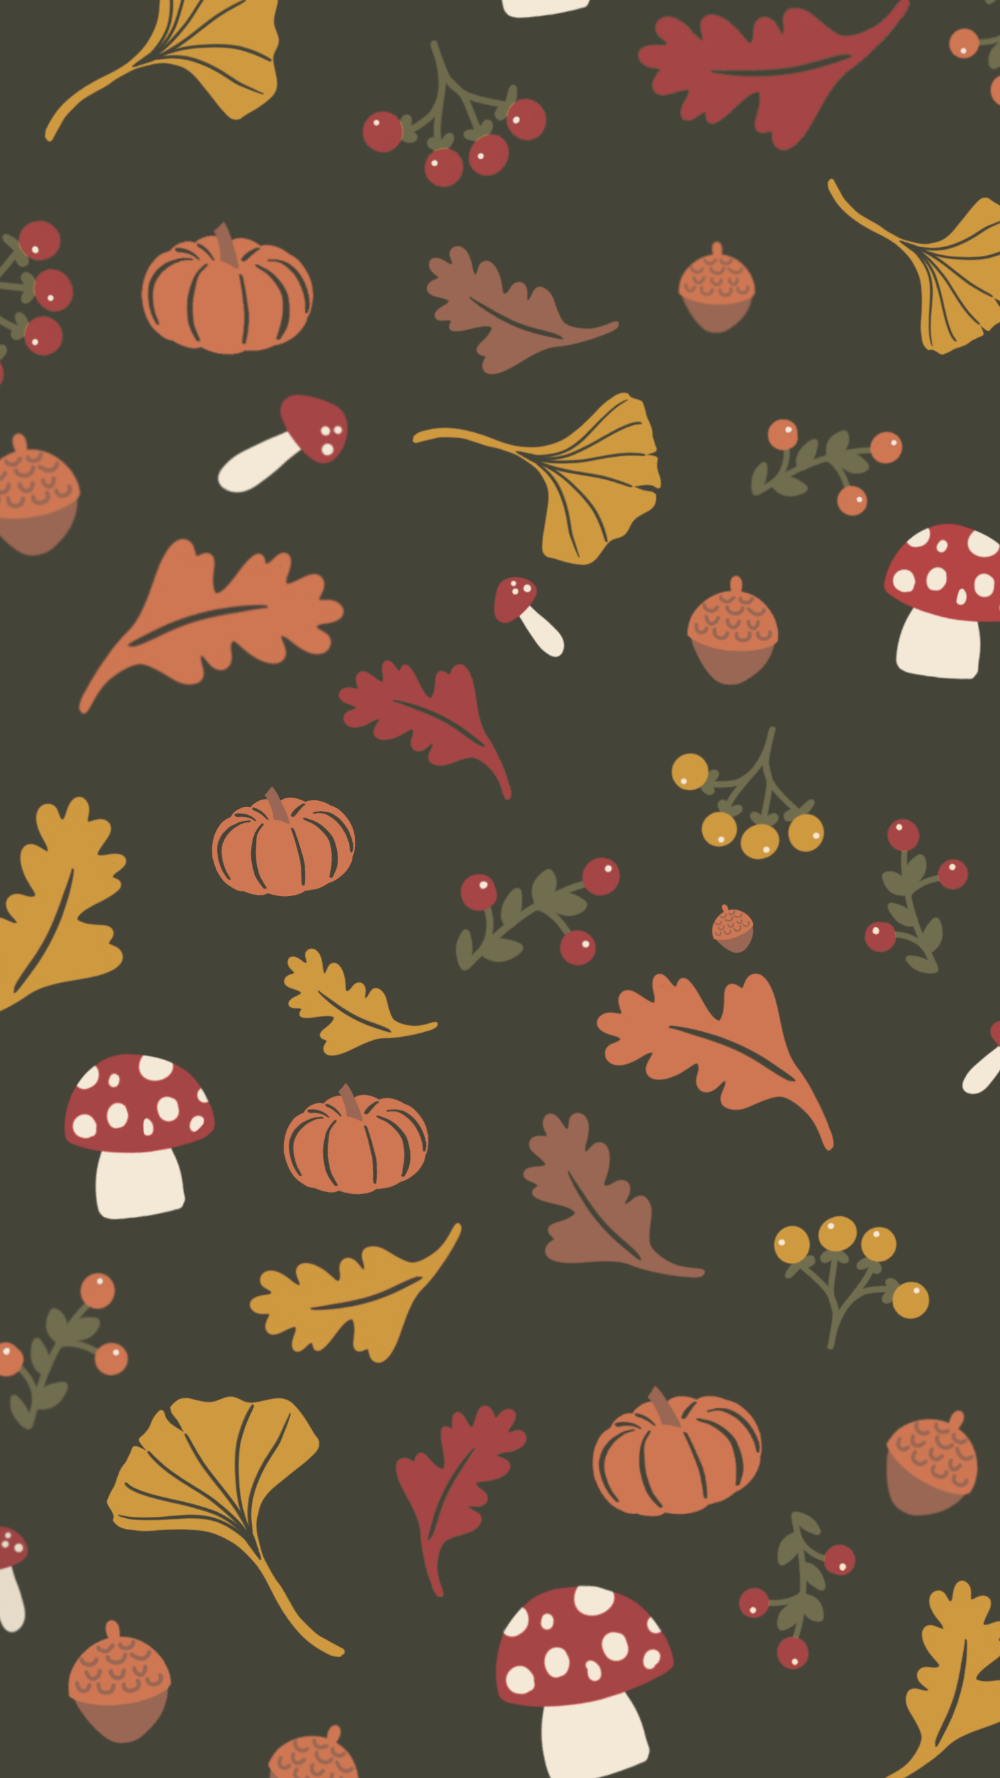 Free Seasonal Wallpapers for Christmas and Thanksgiving — Alix Carman